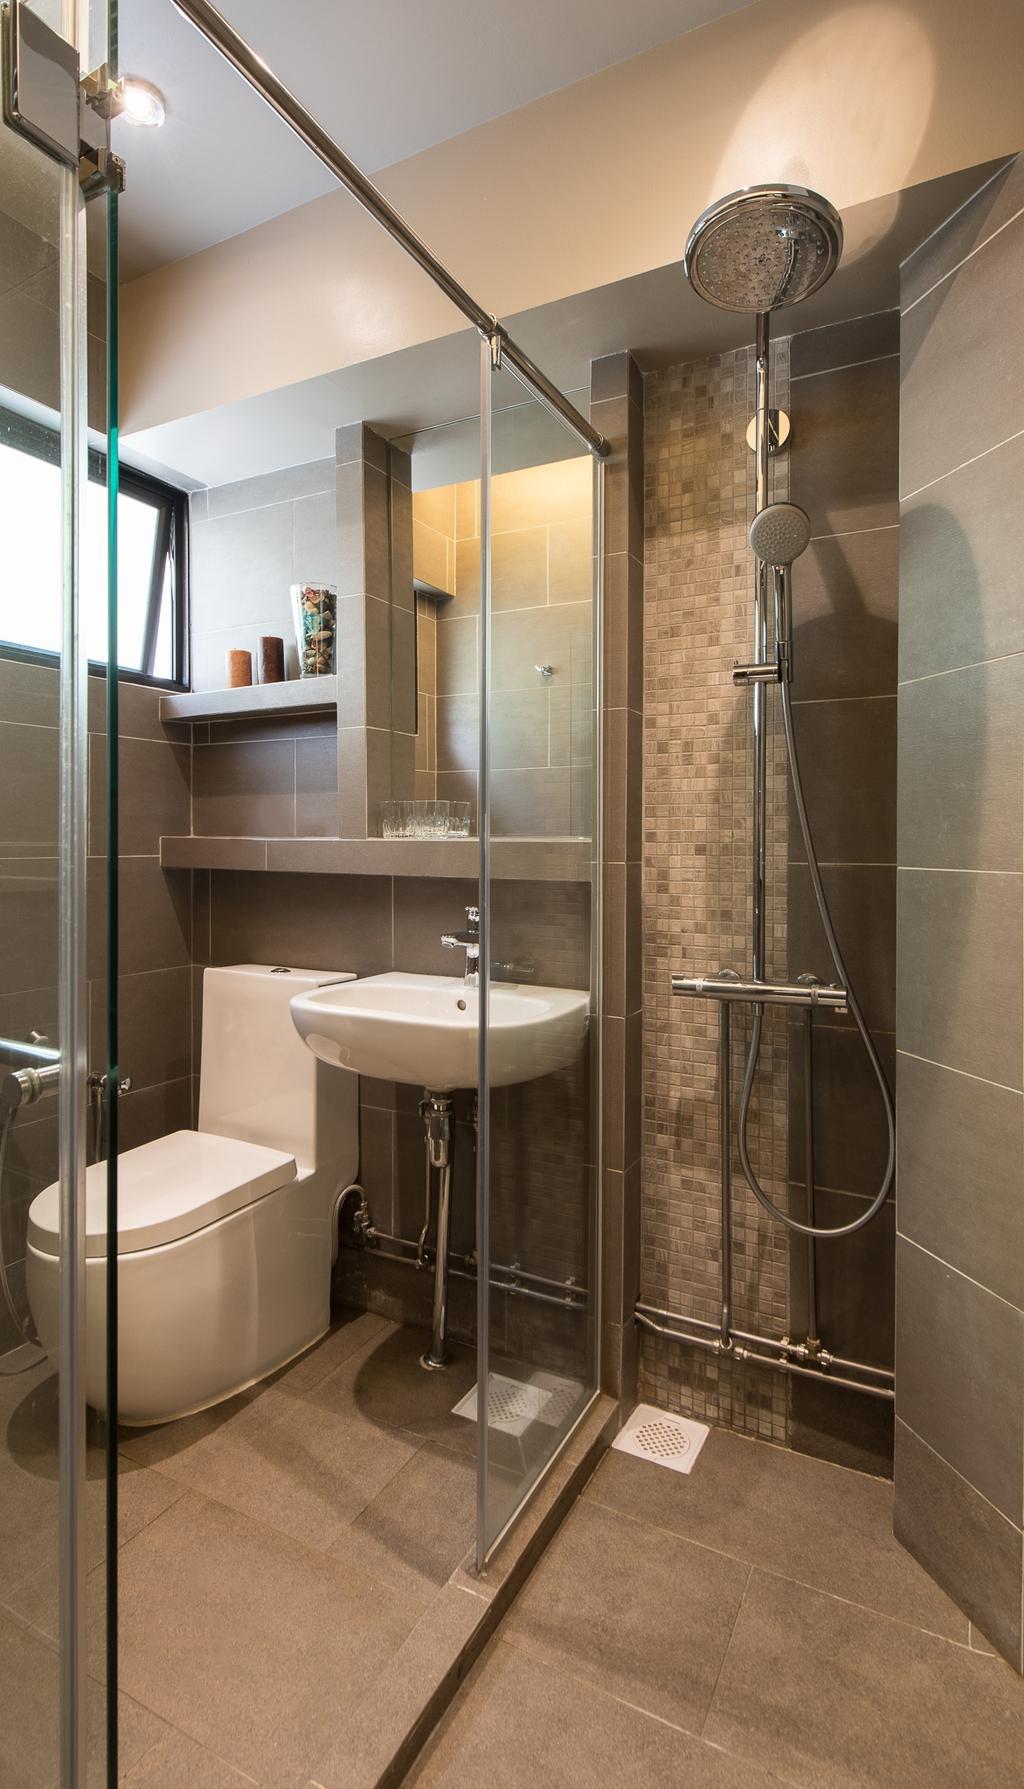 Traditional, HDB, Bathroom, Woodlands Street 41 (Block 418), Interior Designer, Fatema Design Studio, Shower, Shower Screen, Sink, Toilet Bowl, Indoors, Interior Design, Room